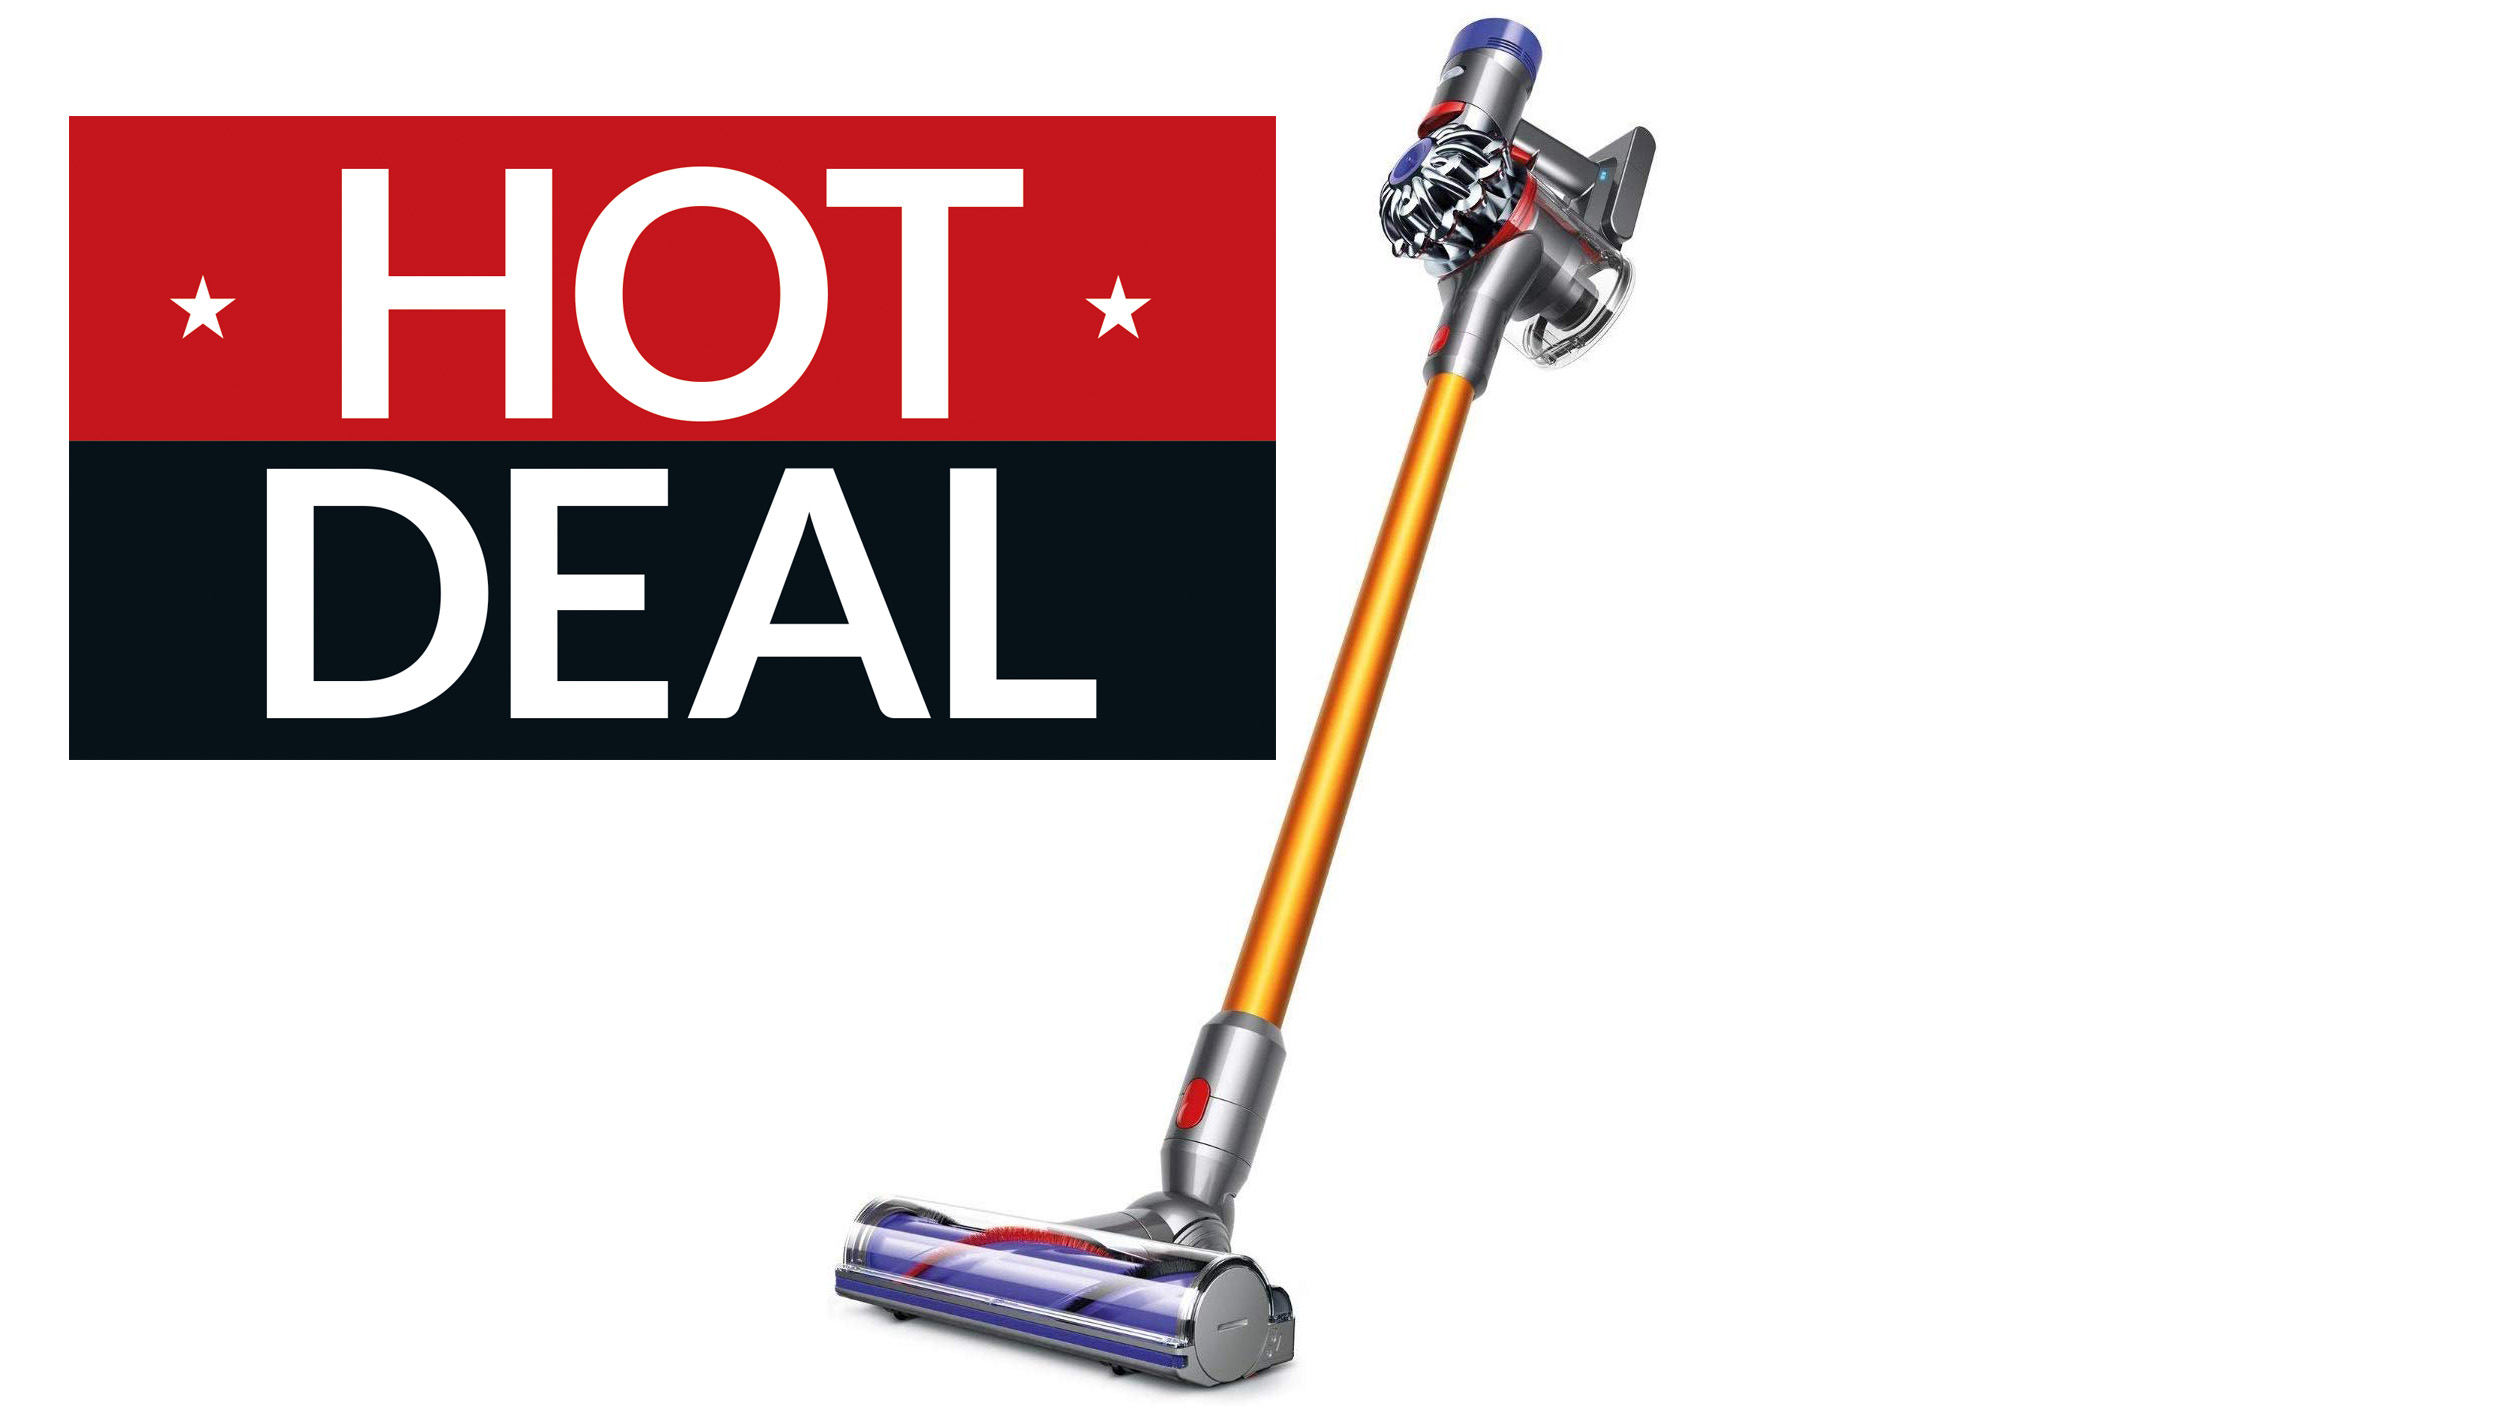 Dyson kohls sale dyson multi floor upright vacuum